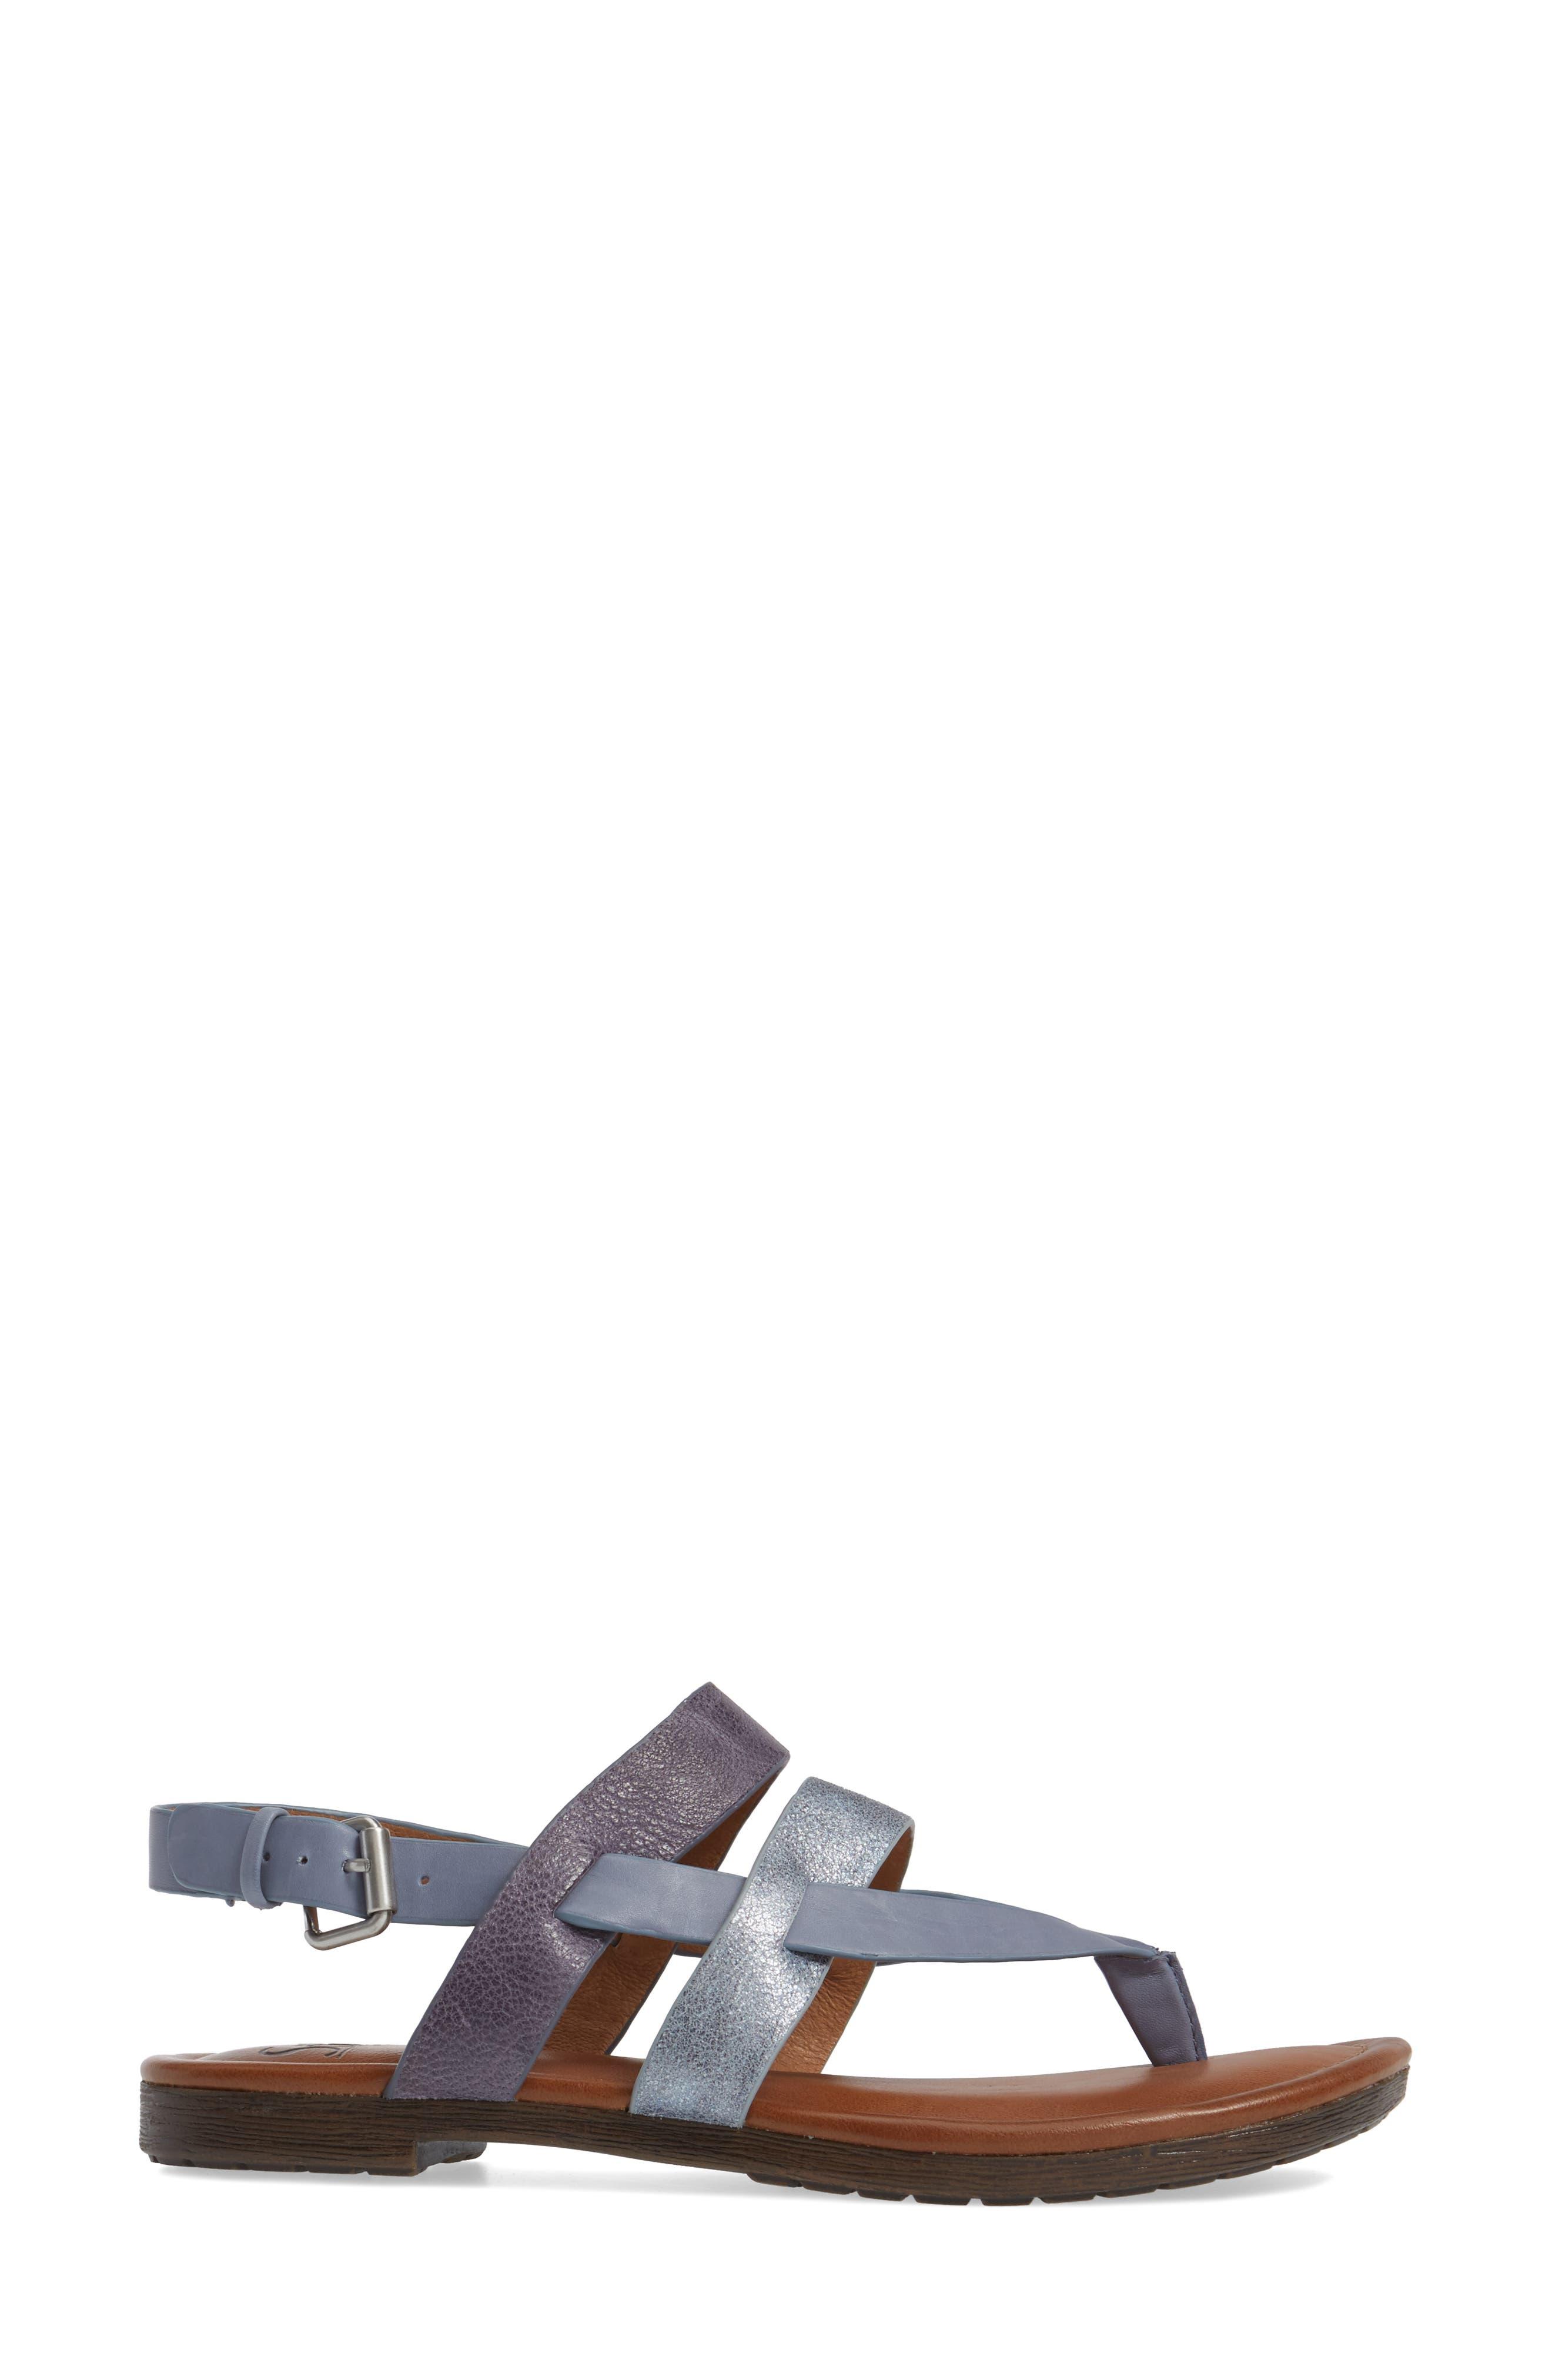 Bena Strappy Sandal,                             Alternate thumbnail 3, color,                             Denim/ Blue/ Pale Blue Leather